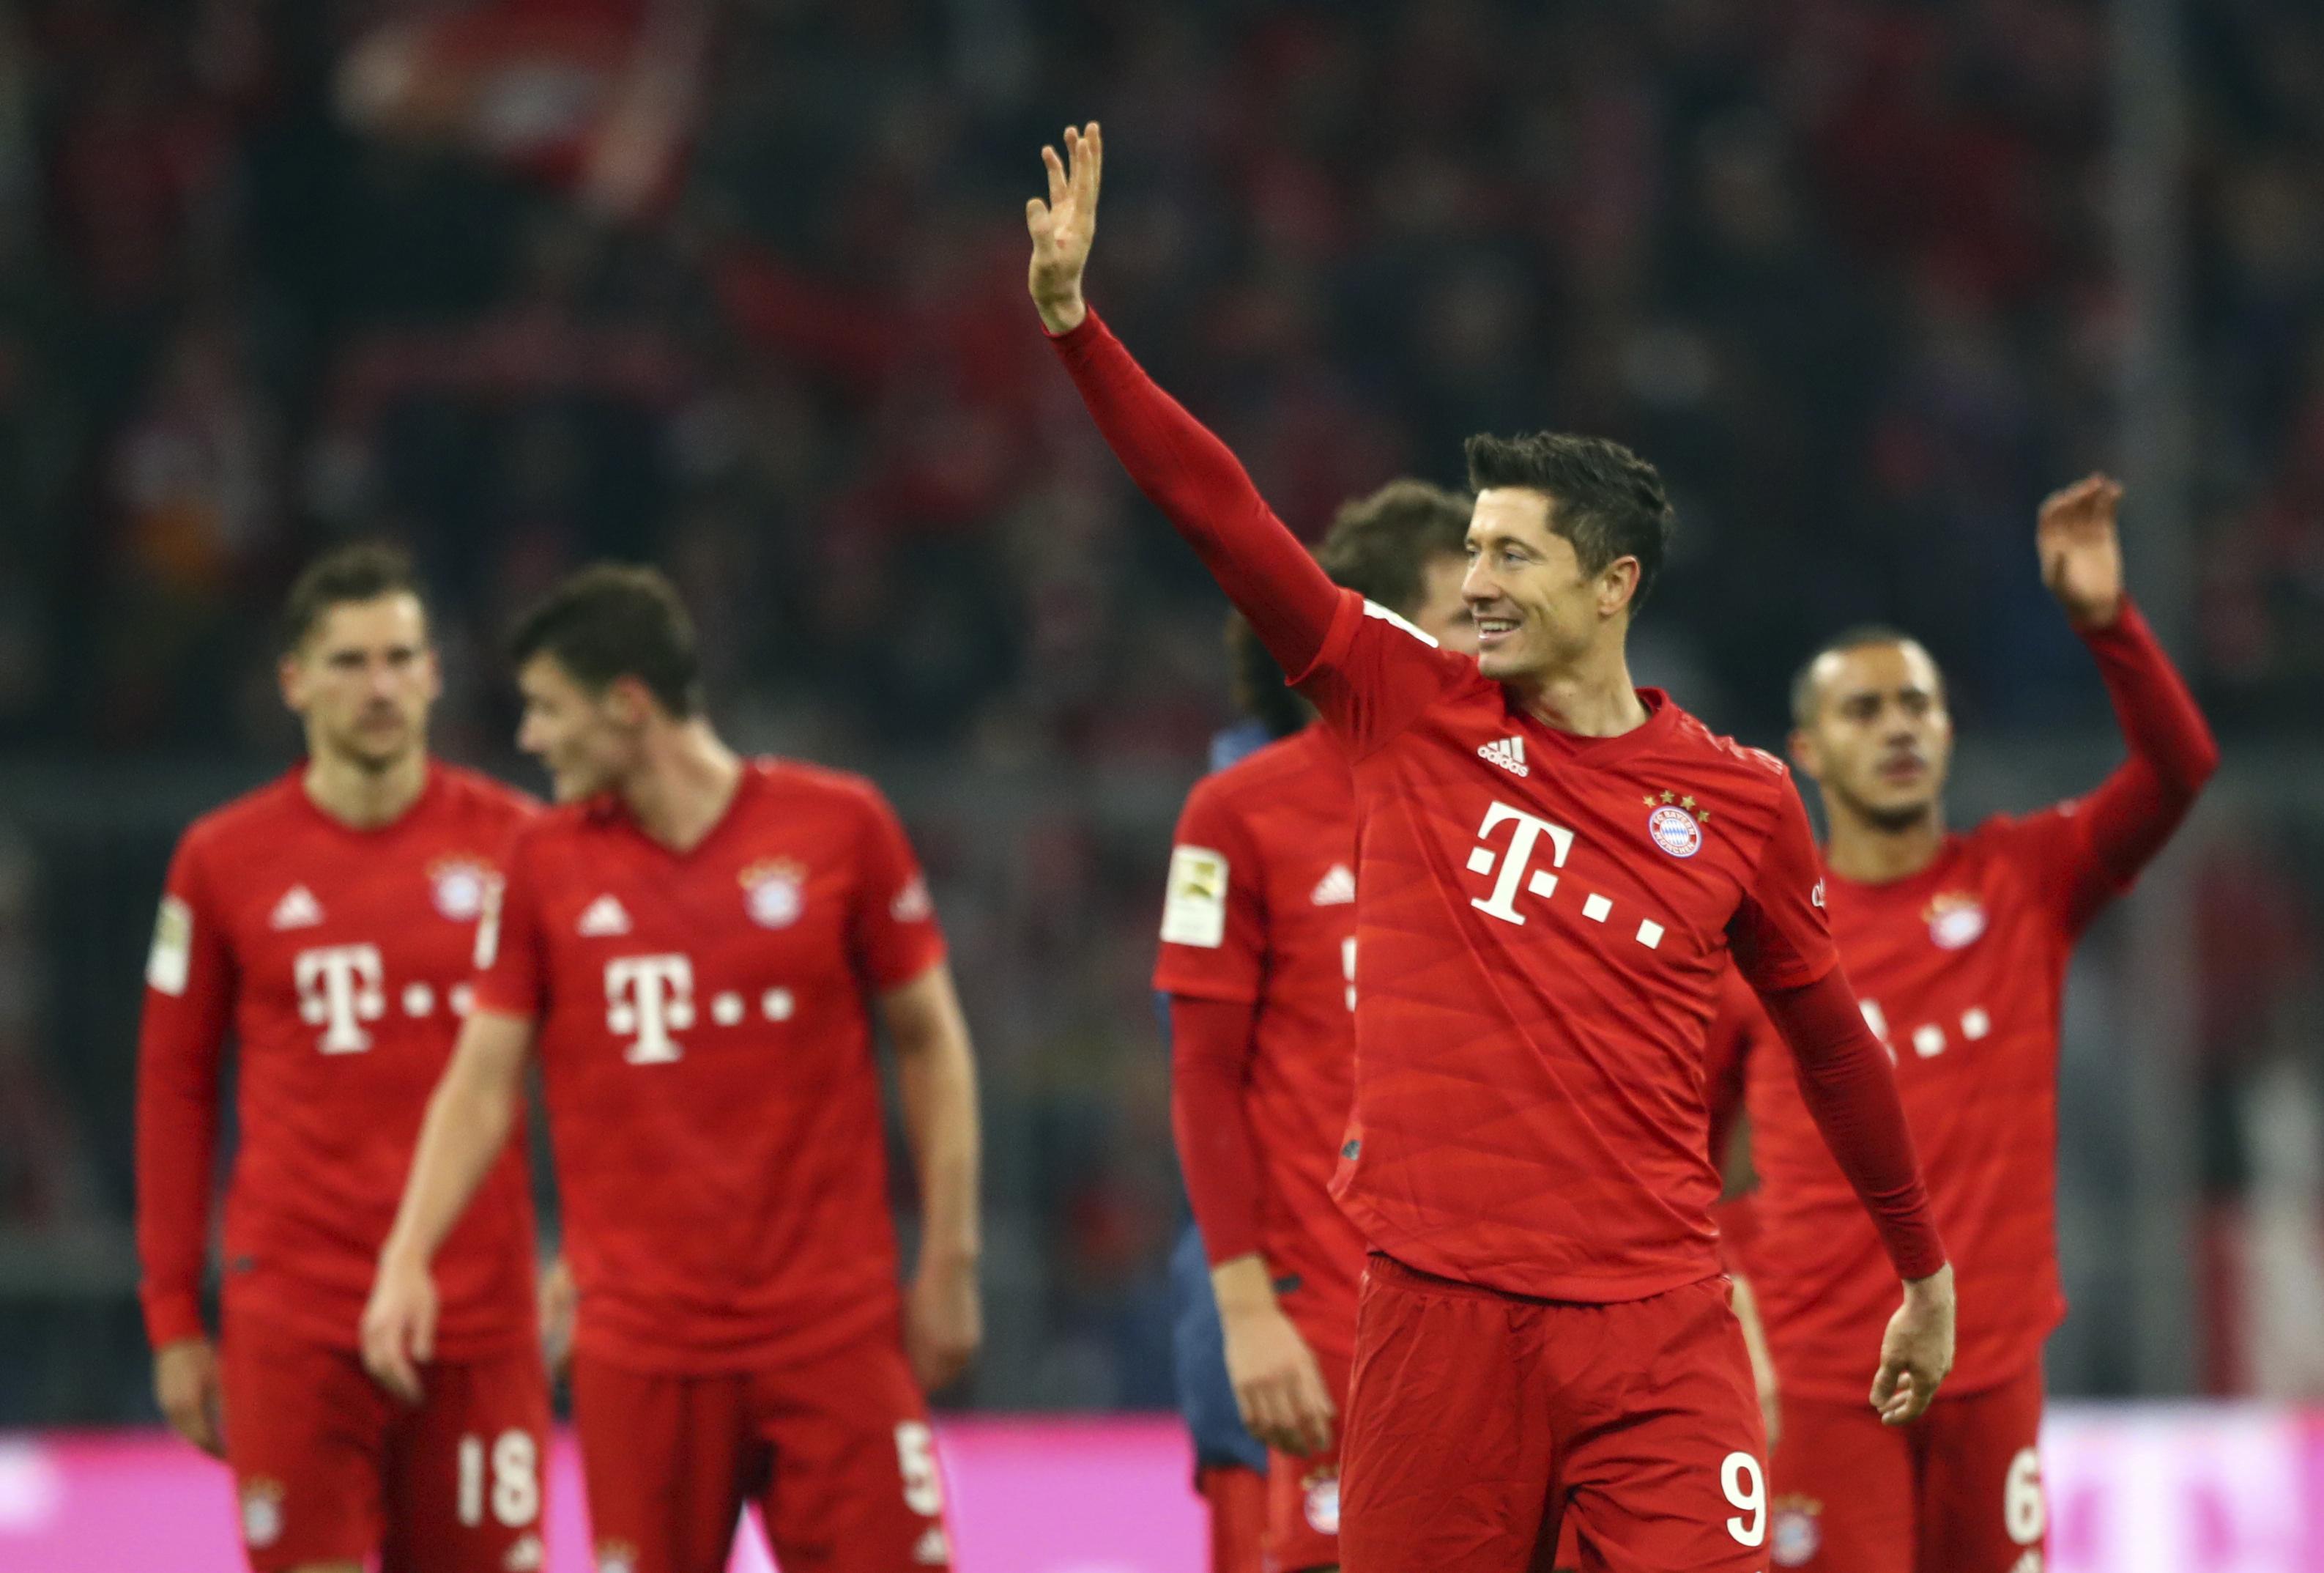 Lewandowski grabs 2 as Bayern crushes Dortmund 4-0